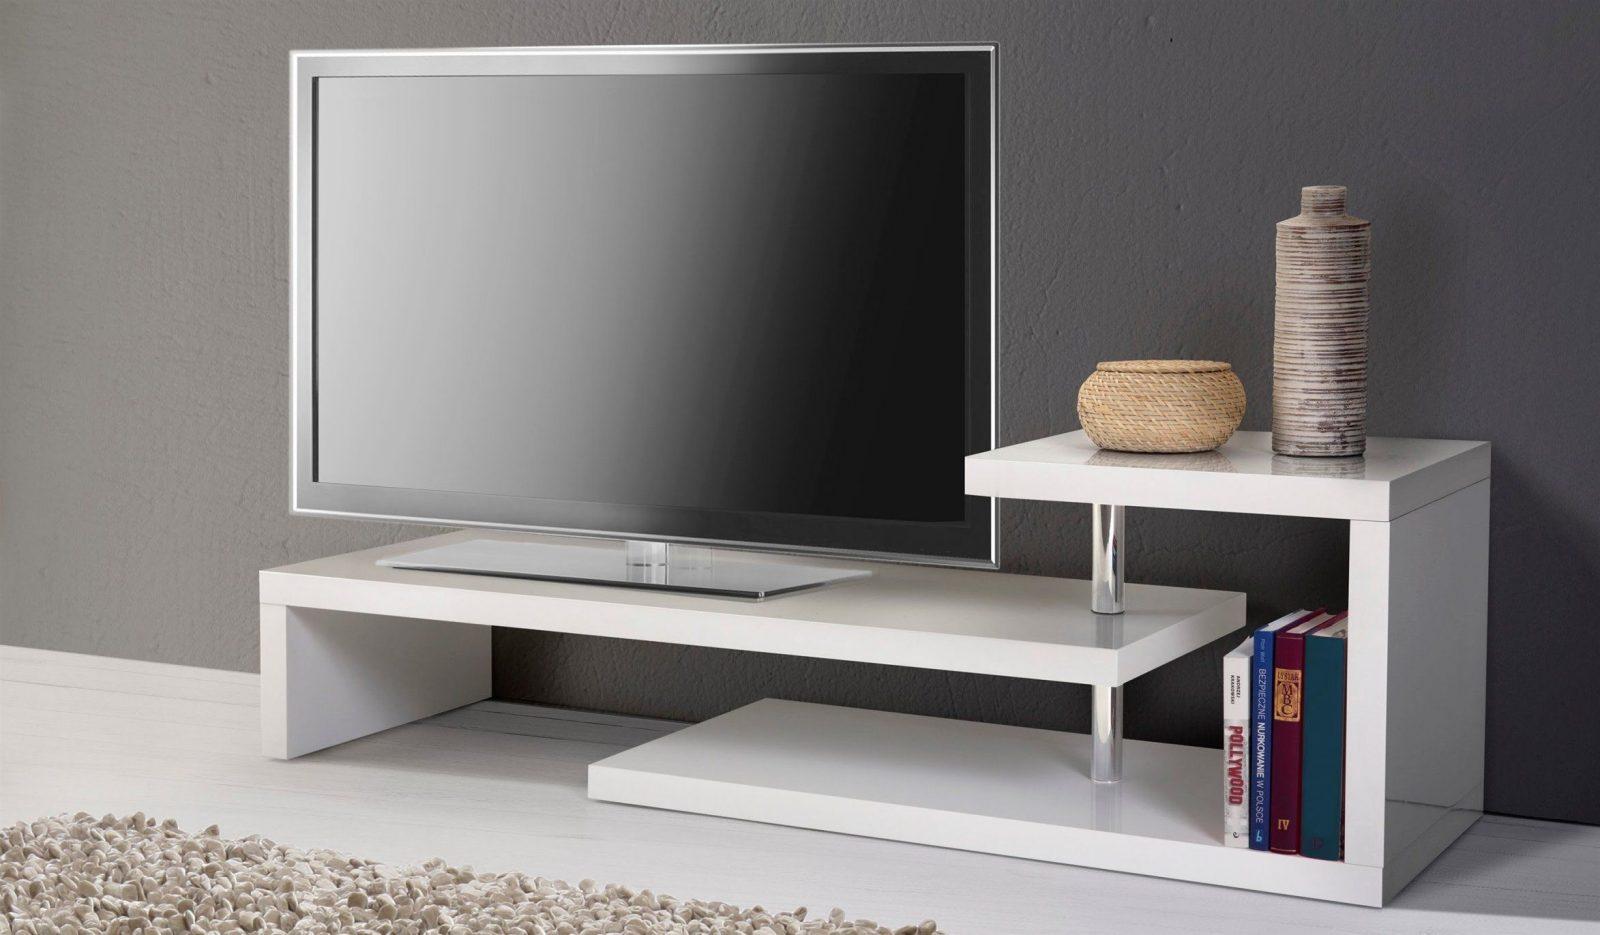 Tv Board Selber Bauen Mit Tv Board Selber Bauen Ehausdesign Co 13 von Tv Board Selber Bauen Photo